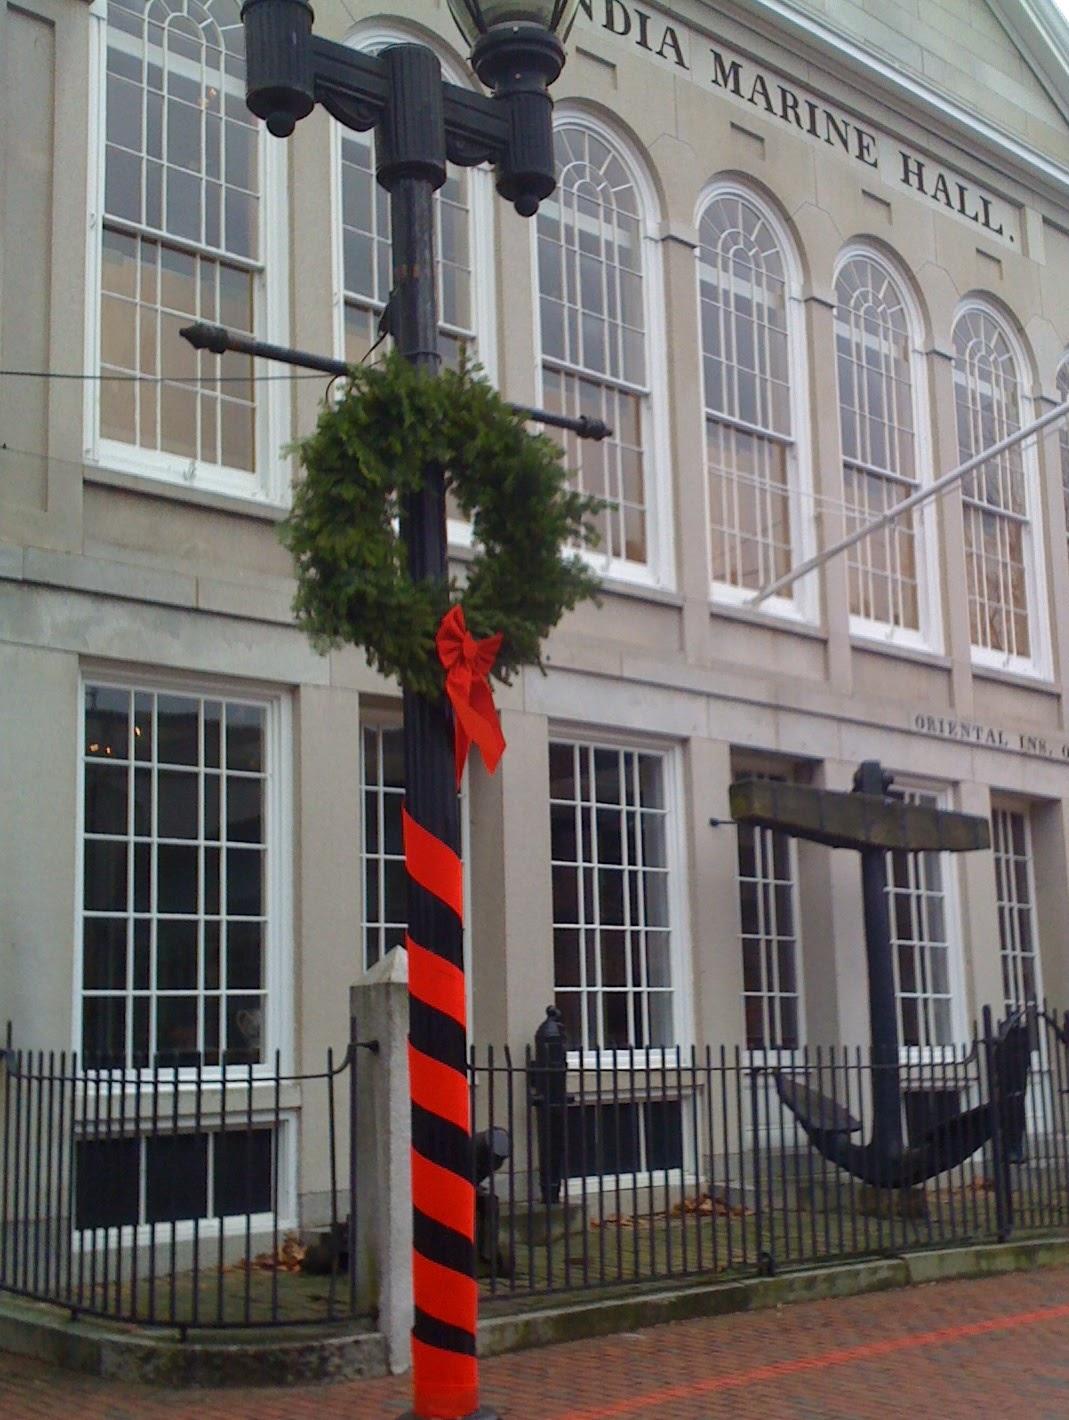 Salem Still Making History Ready To Usher In The Holiday Season